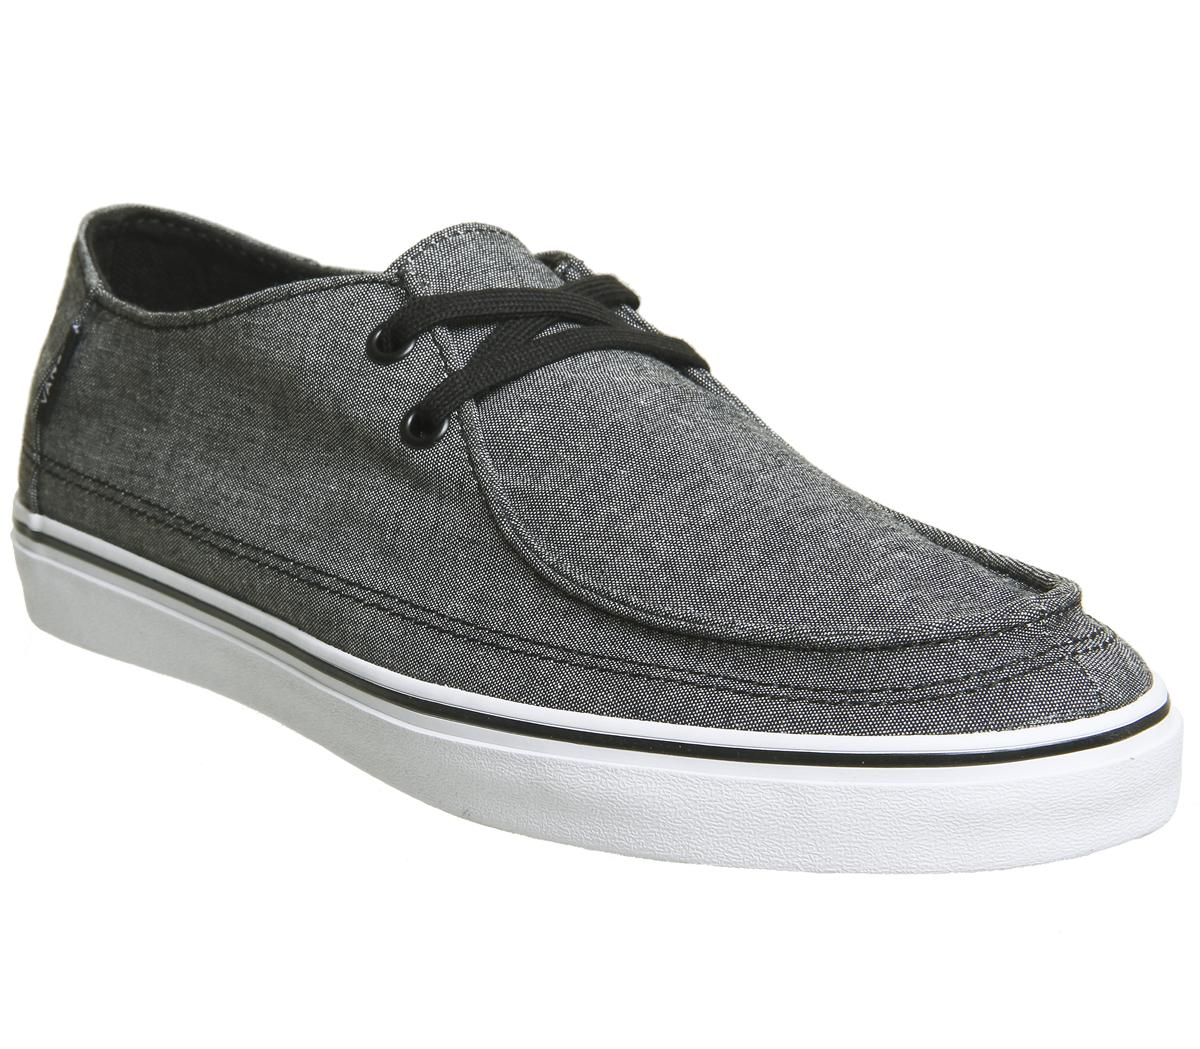 Vans Rata Vulc Shoes Black Chambray